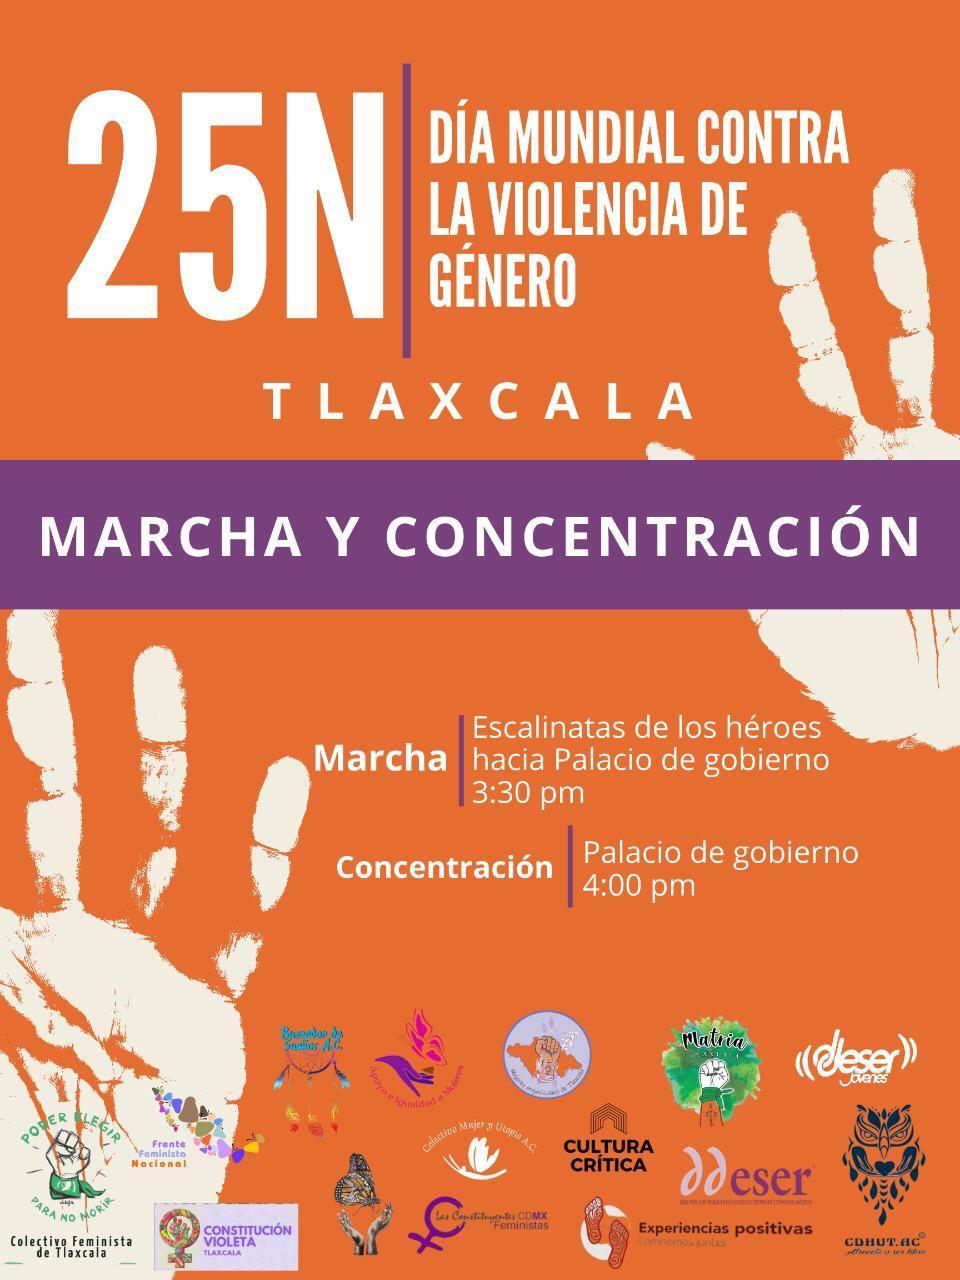 Foto: Colectivo Feminista Tlaxcala